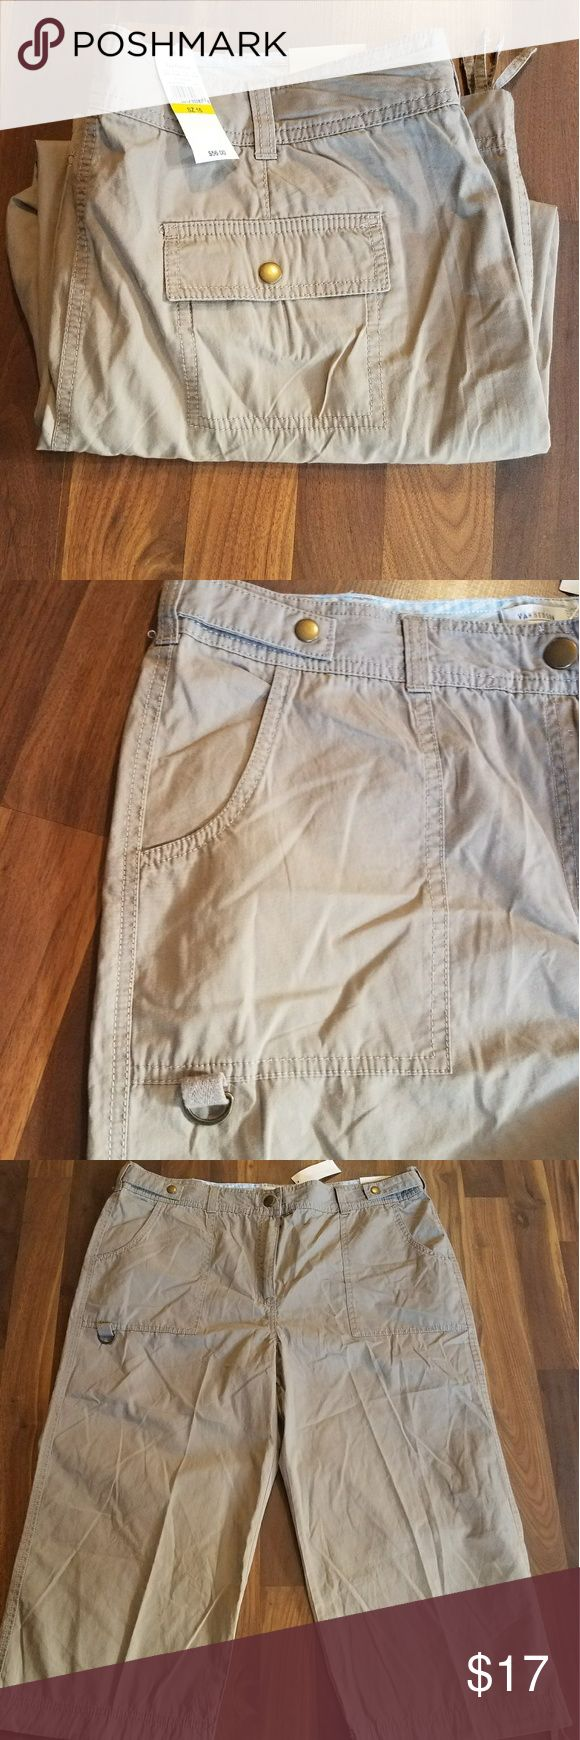 Van Heusen Khaki Capri Pants Casual Wear. Perfect for summer. New with tags. Van Heusen Pants Capris